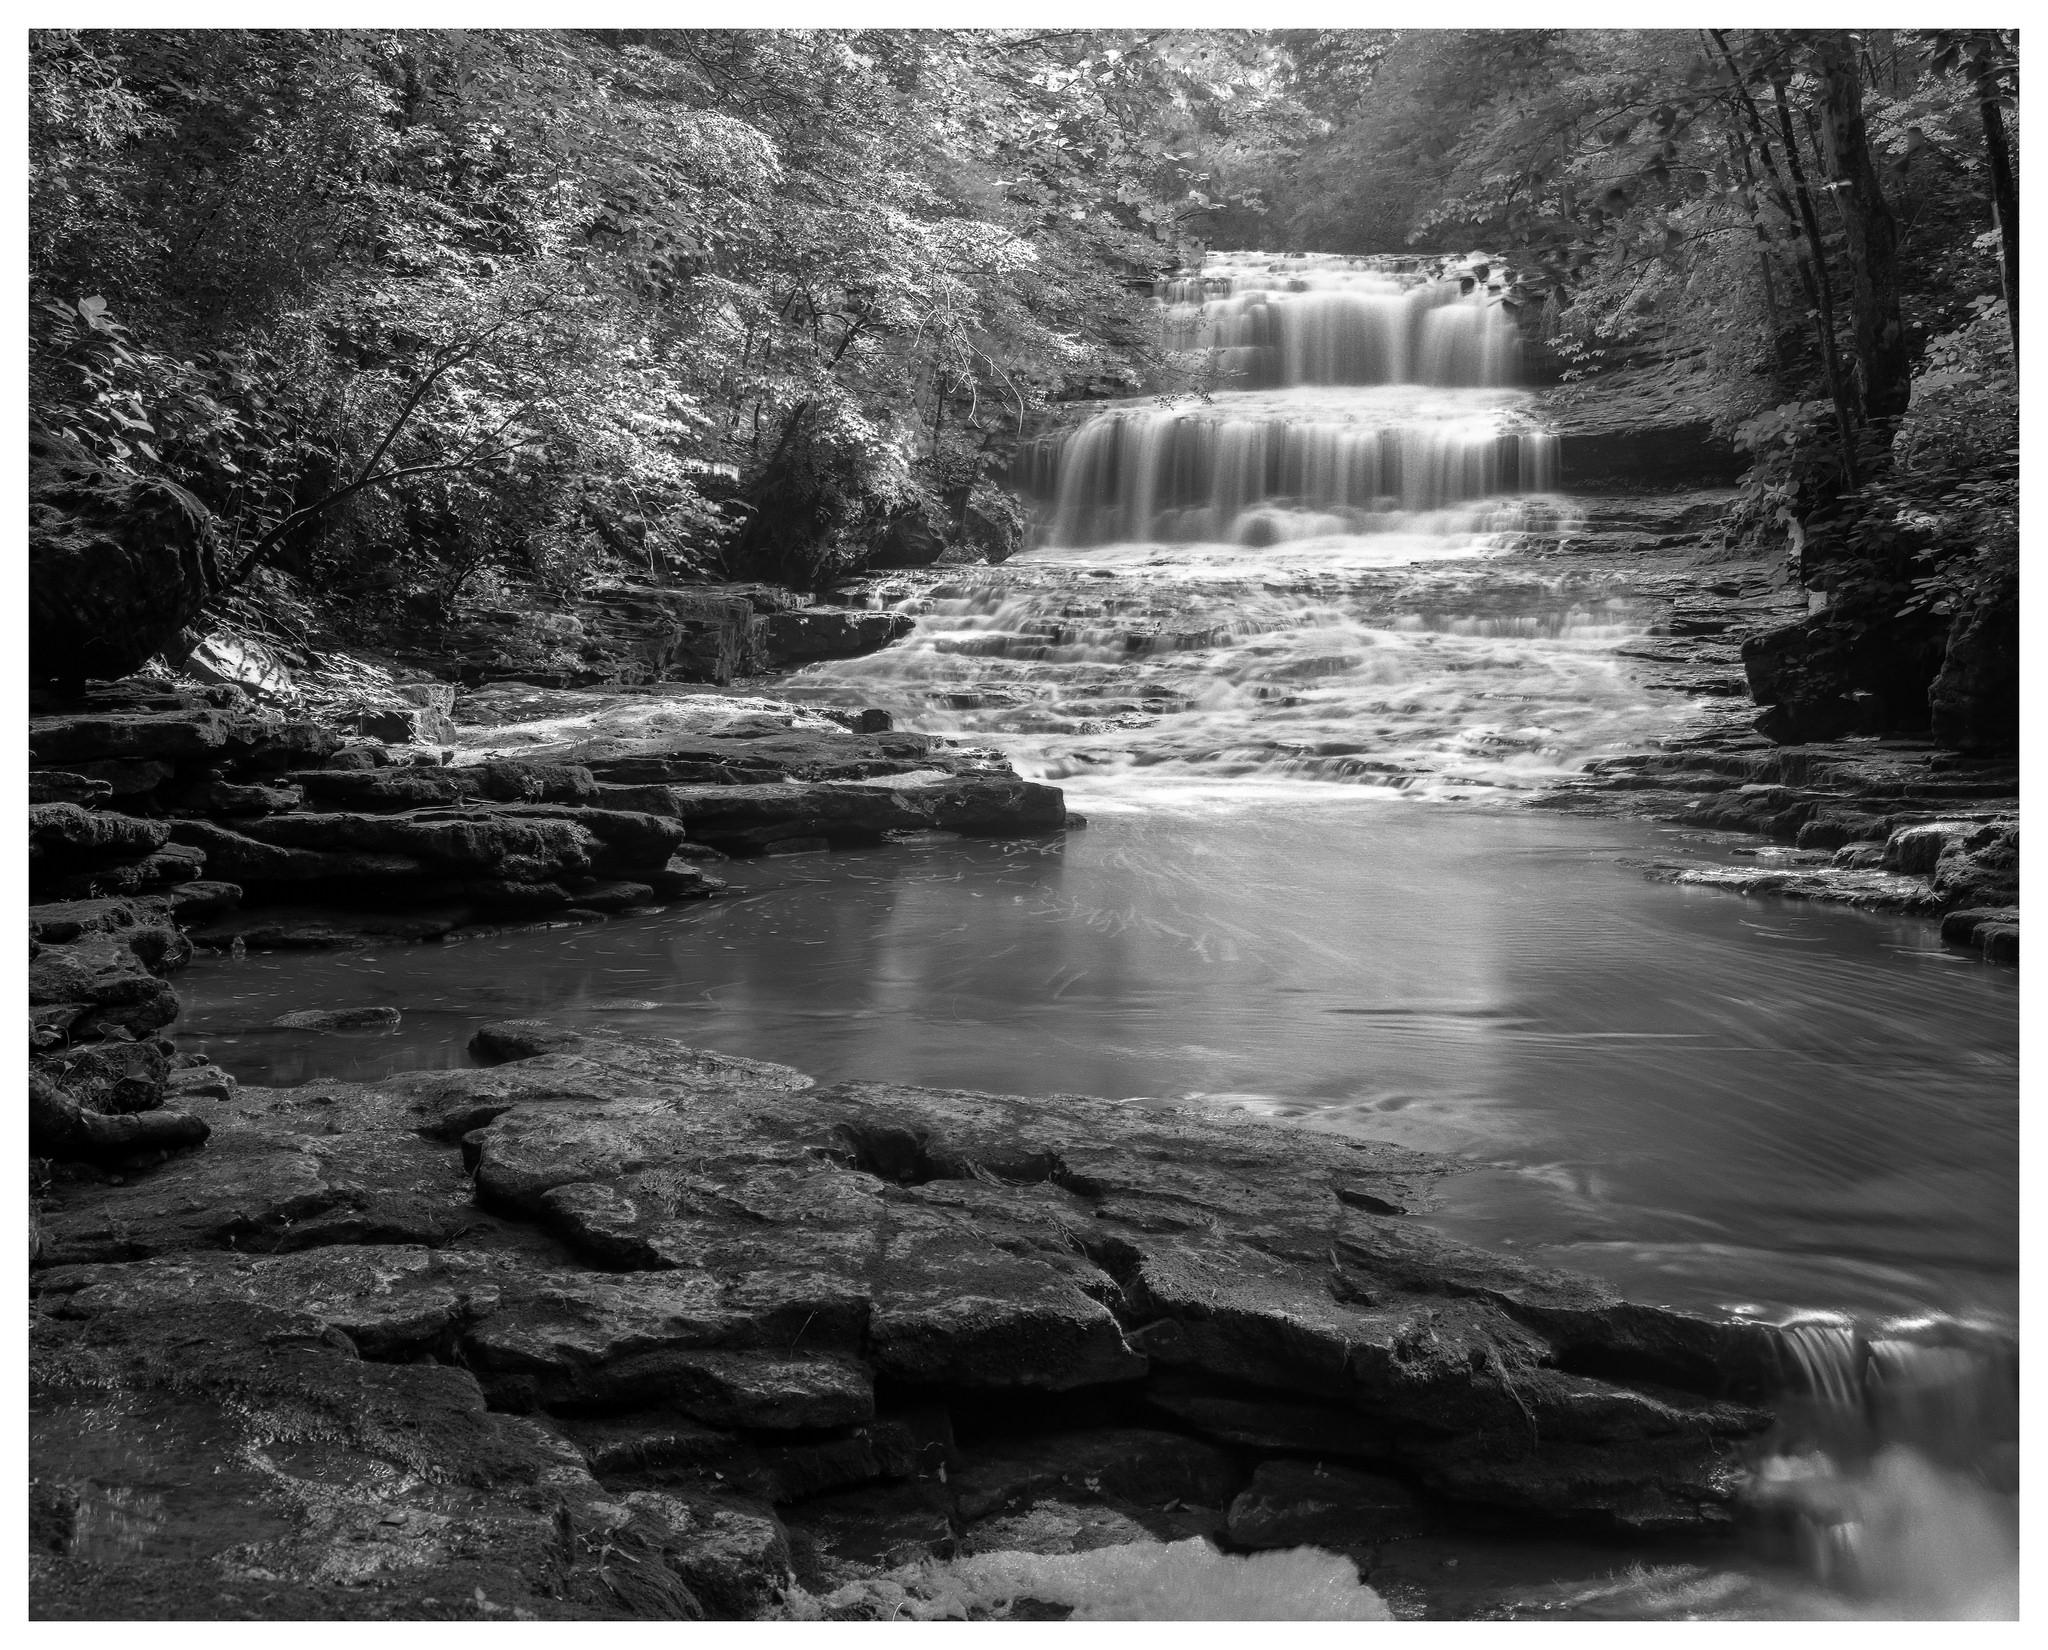 Fallsville Falls – Mamiya RB67 ProS w/90mm lens, polarizer, and 4-stop ND filter on Kodak Tmax 100 film @ f/16, 45 seconds